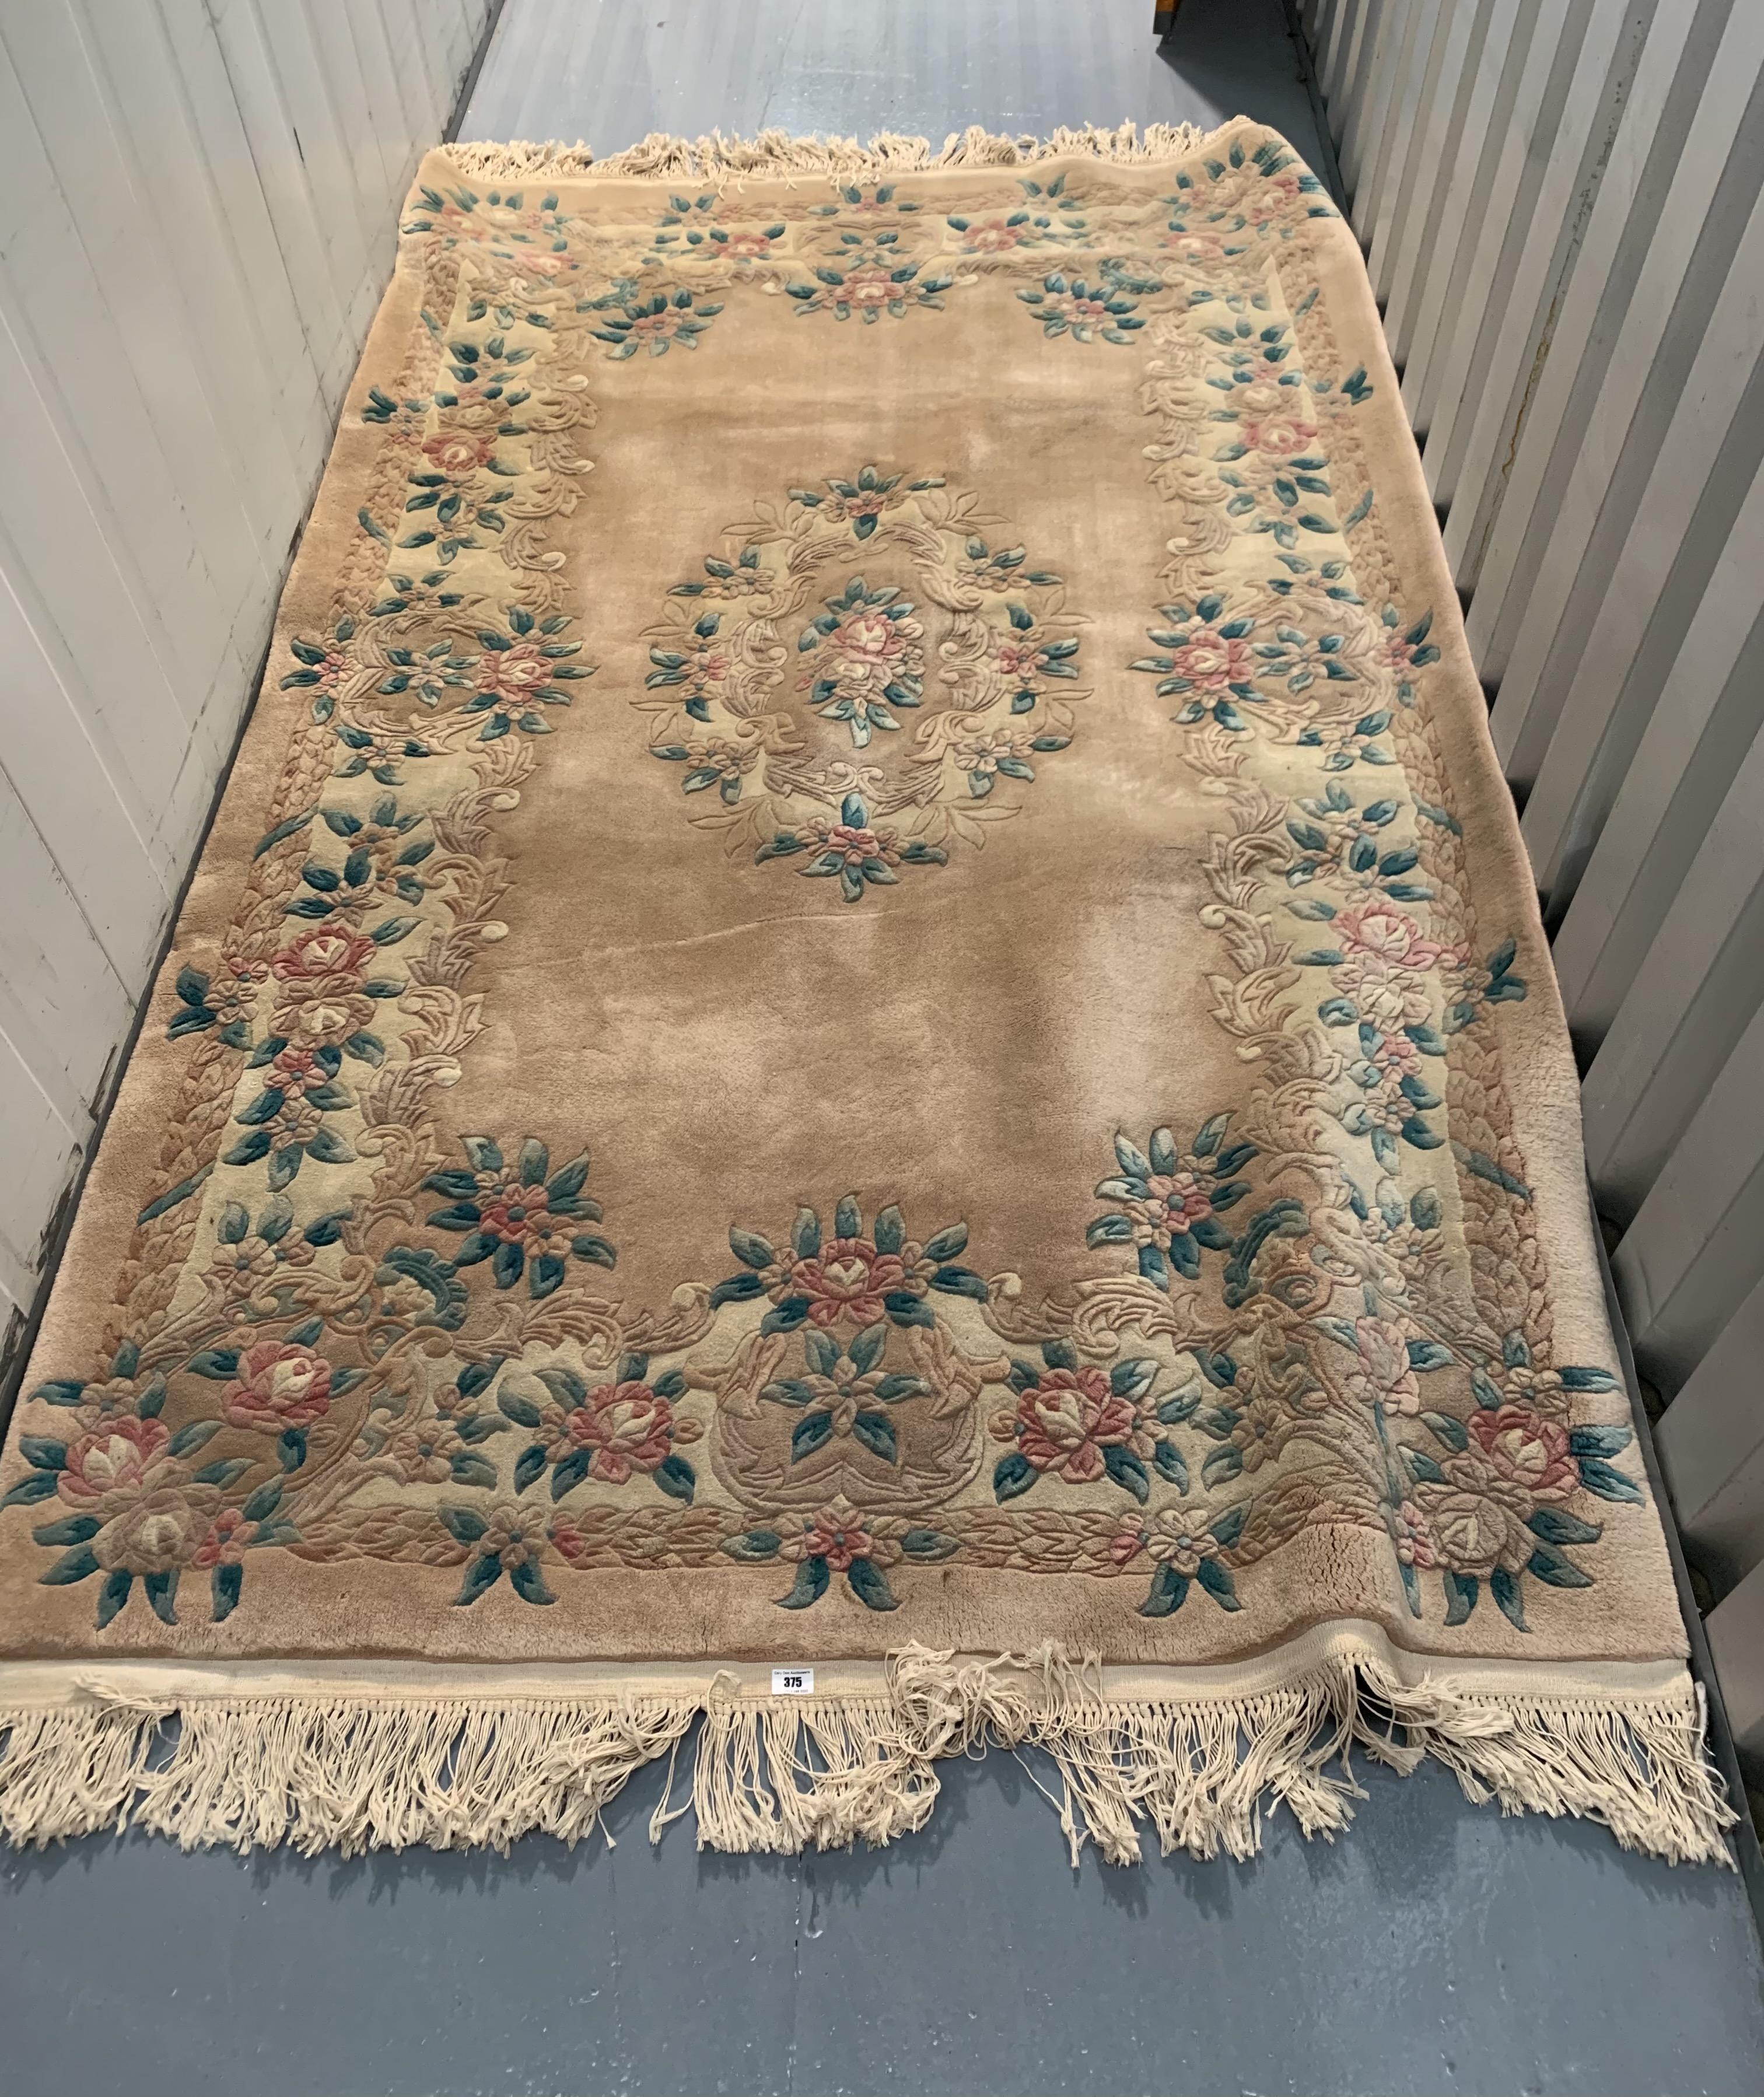 "Pink/beige/green flowered rug, 96"" long, 60"" wide"